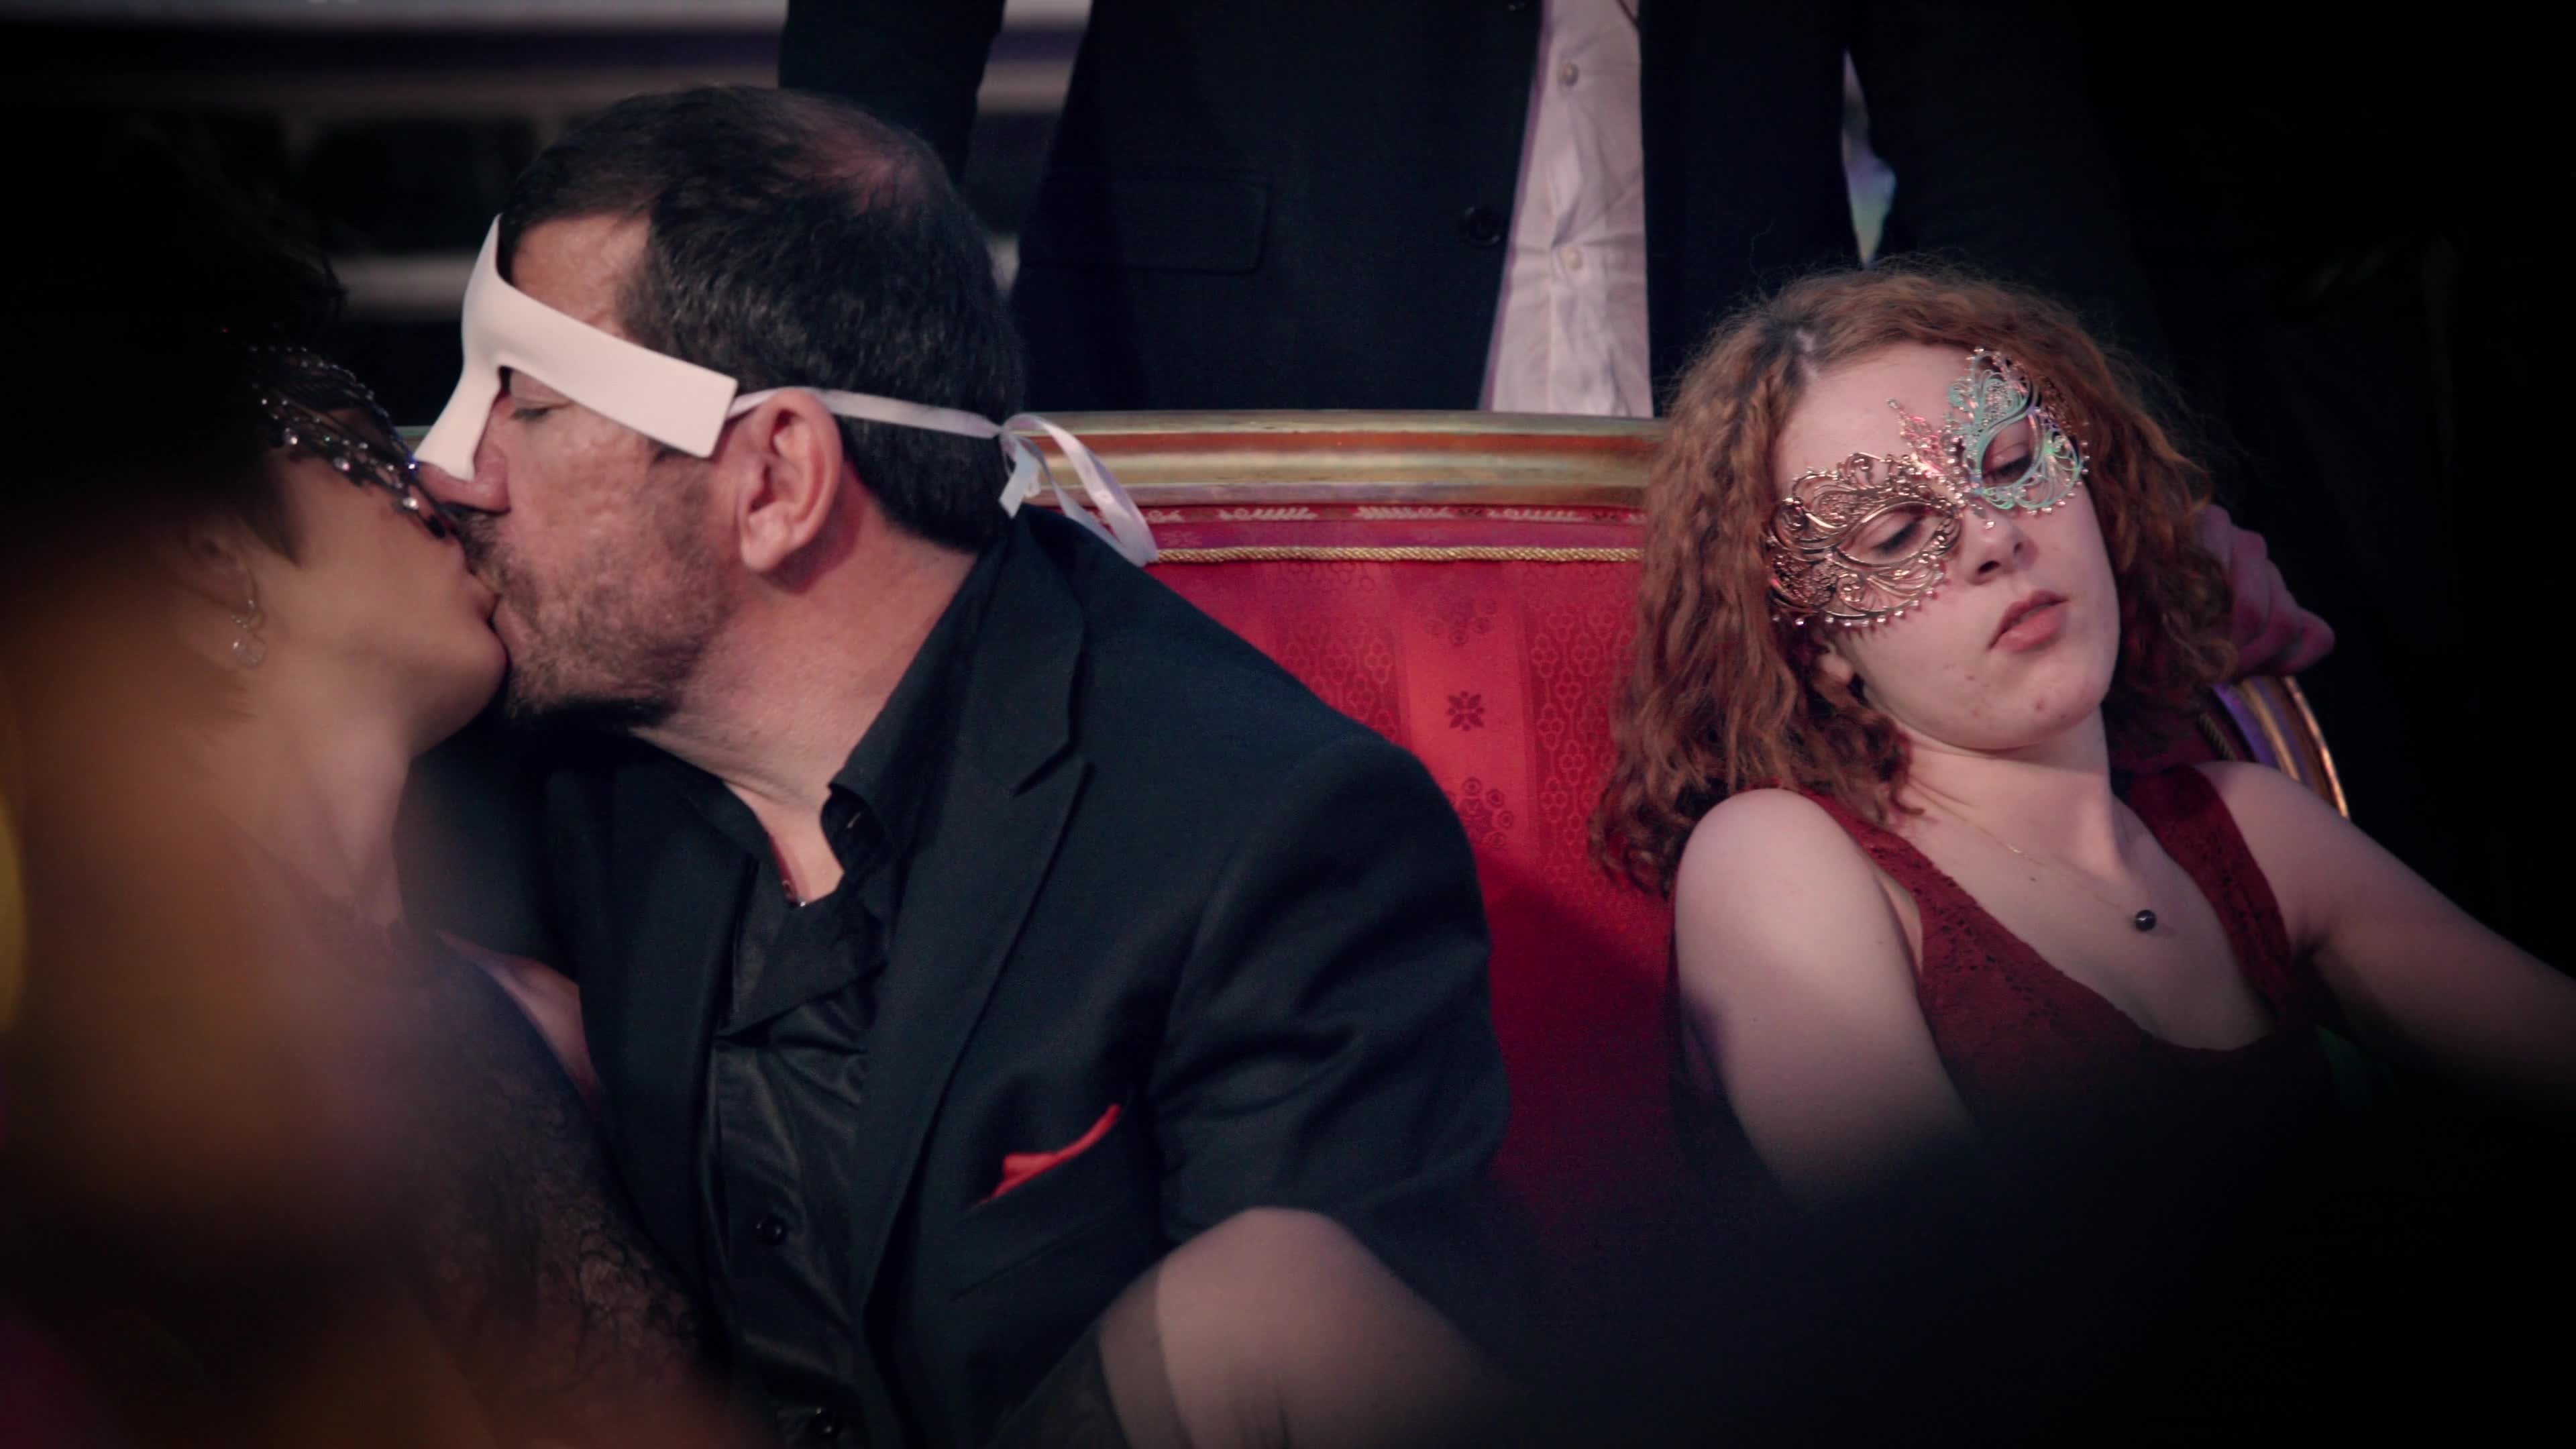 Marc dorcel sex video